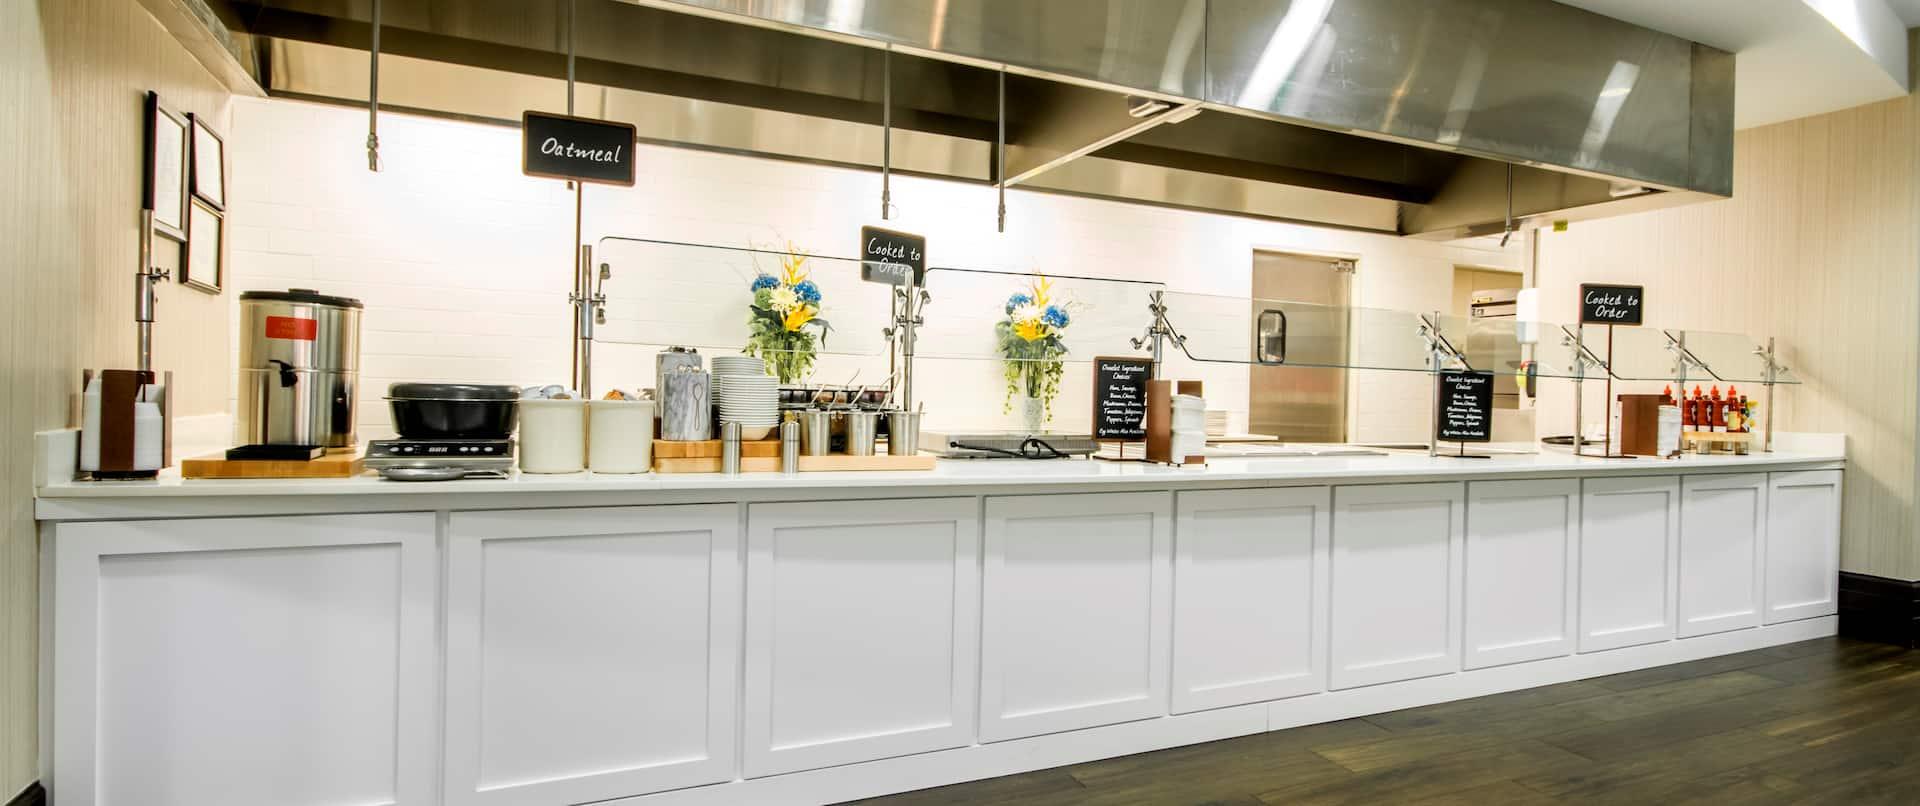 Breakfast Area Serving Stations